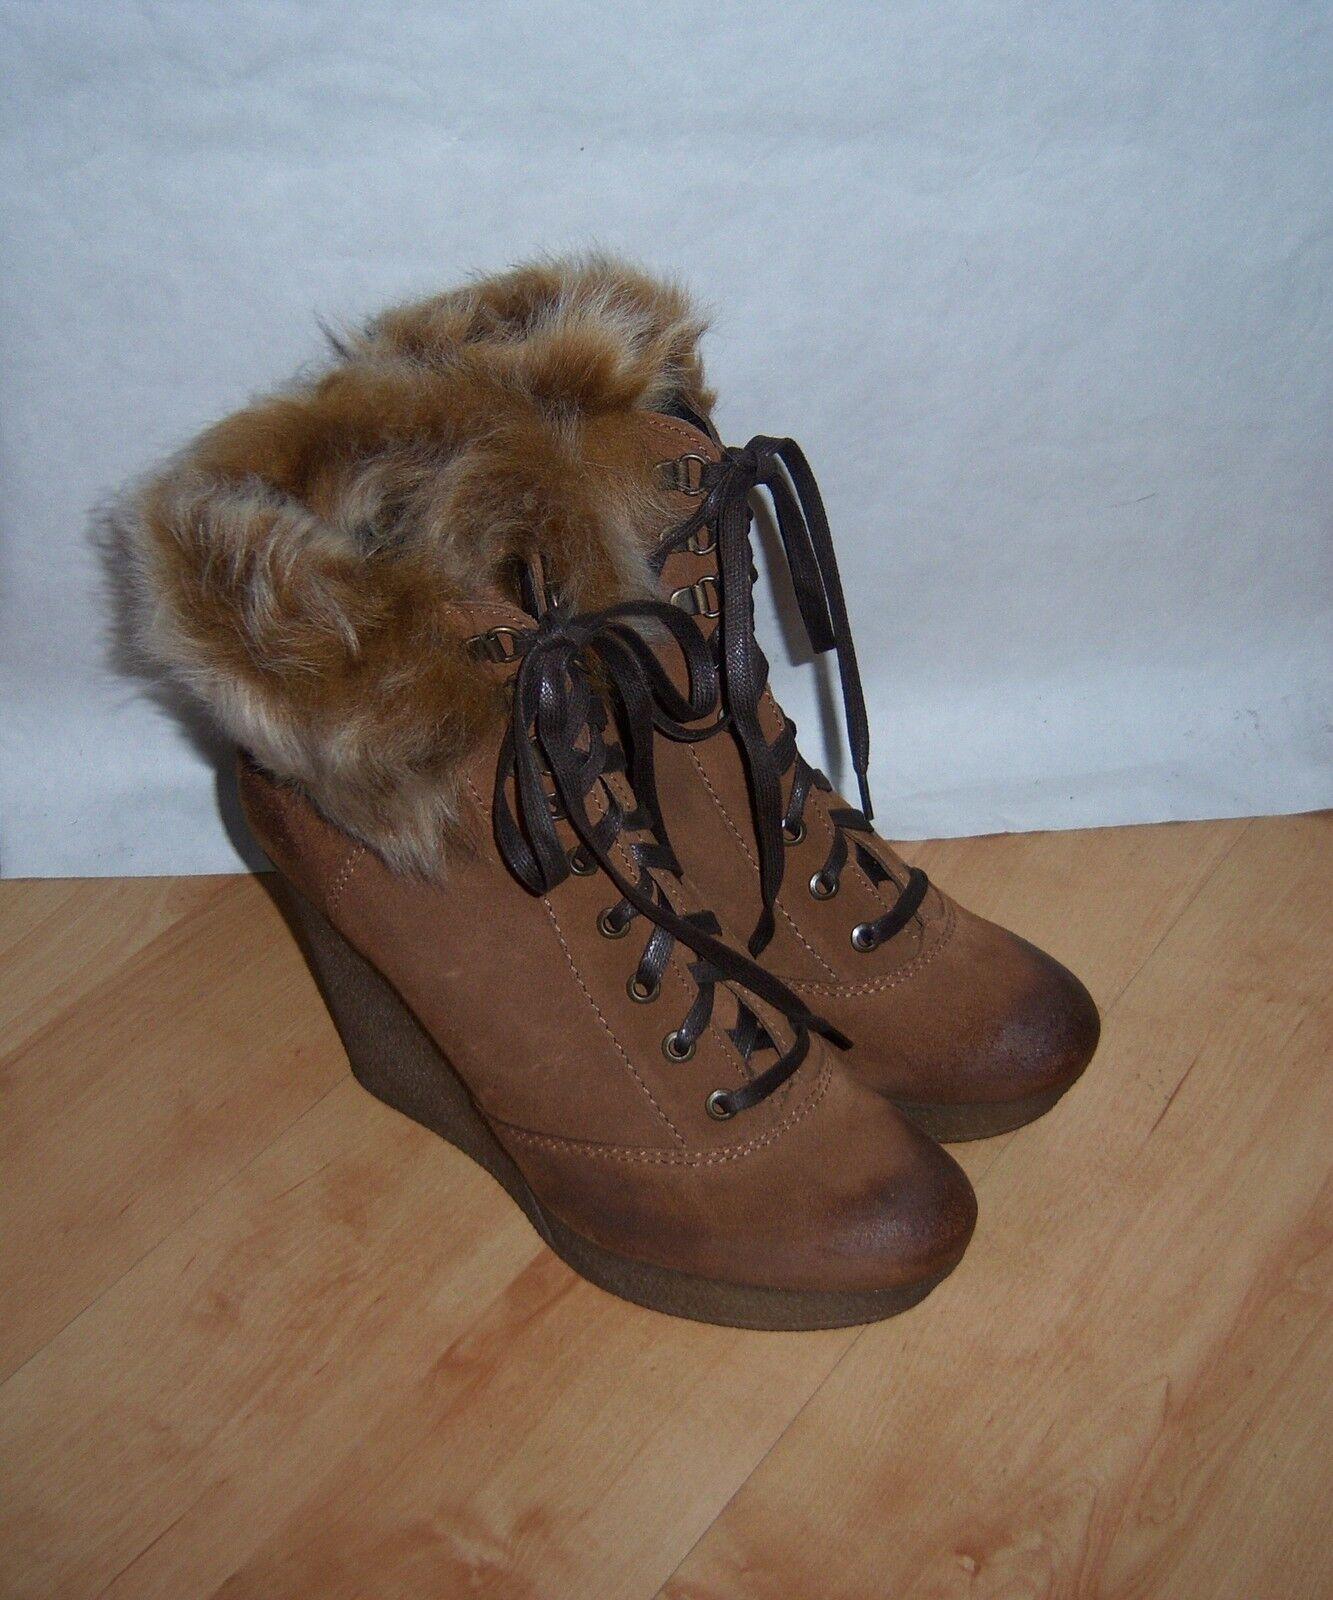 BNIB Bertie ladies suede ankle boots with faux fur trim Größe UK 8